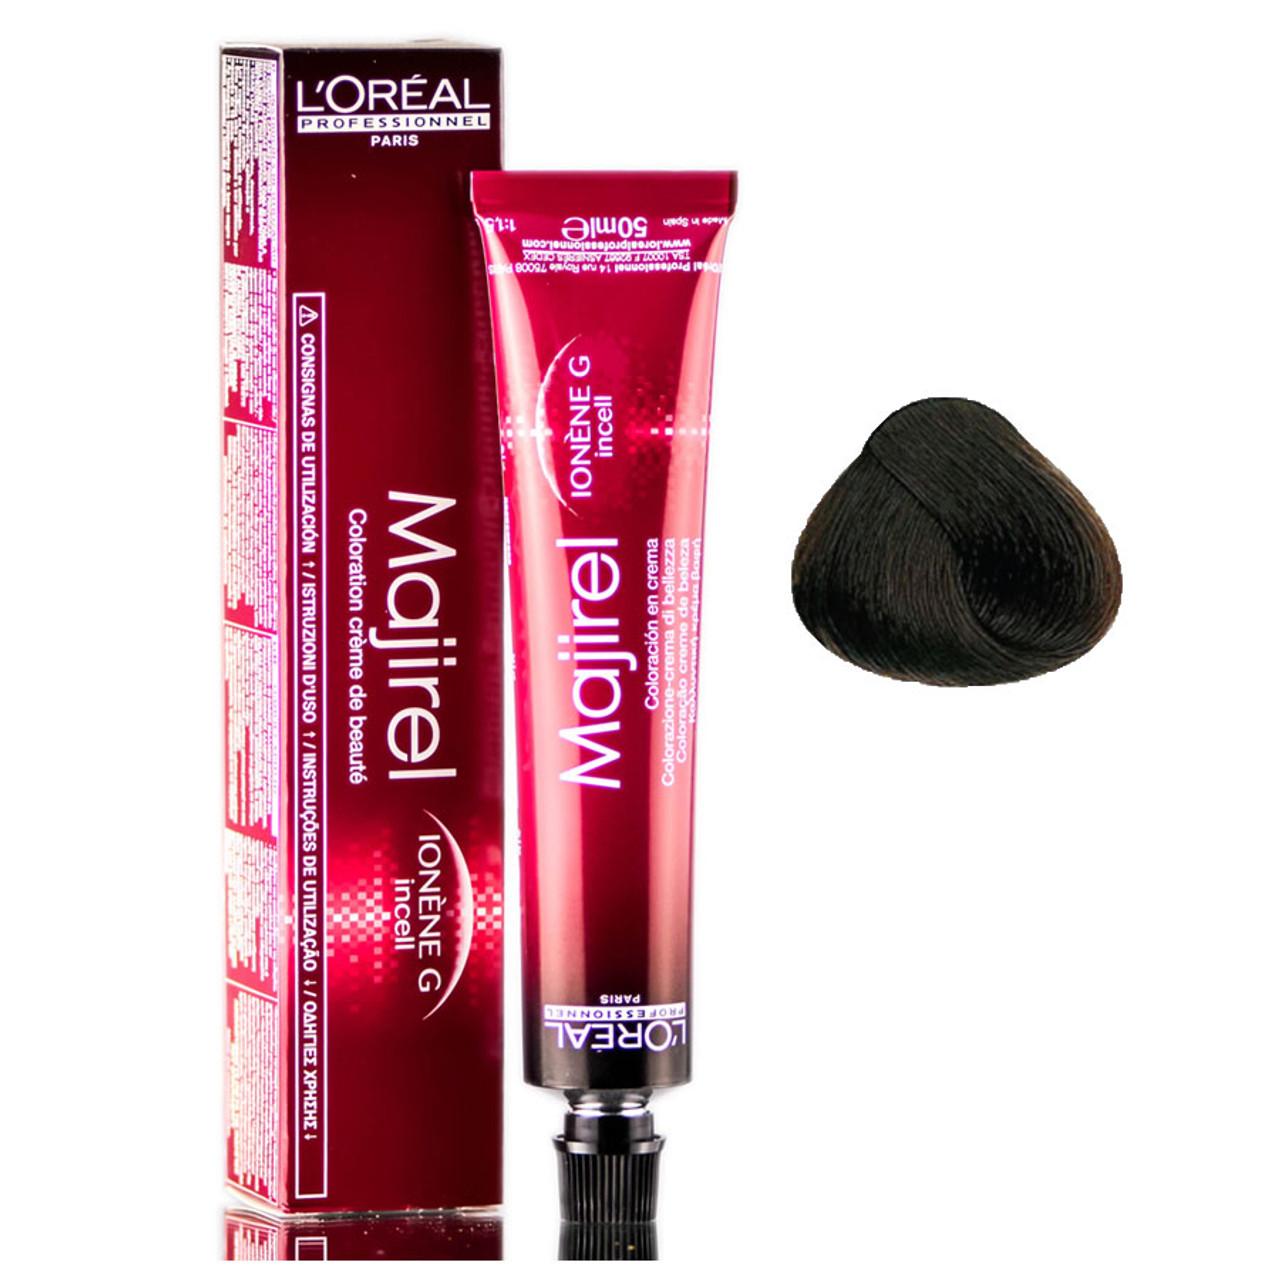 Loreal Majirel Creme Color Sleekshop Formerly Sleekhair 5